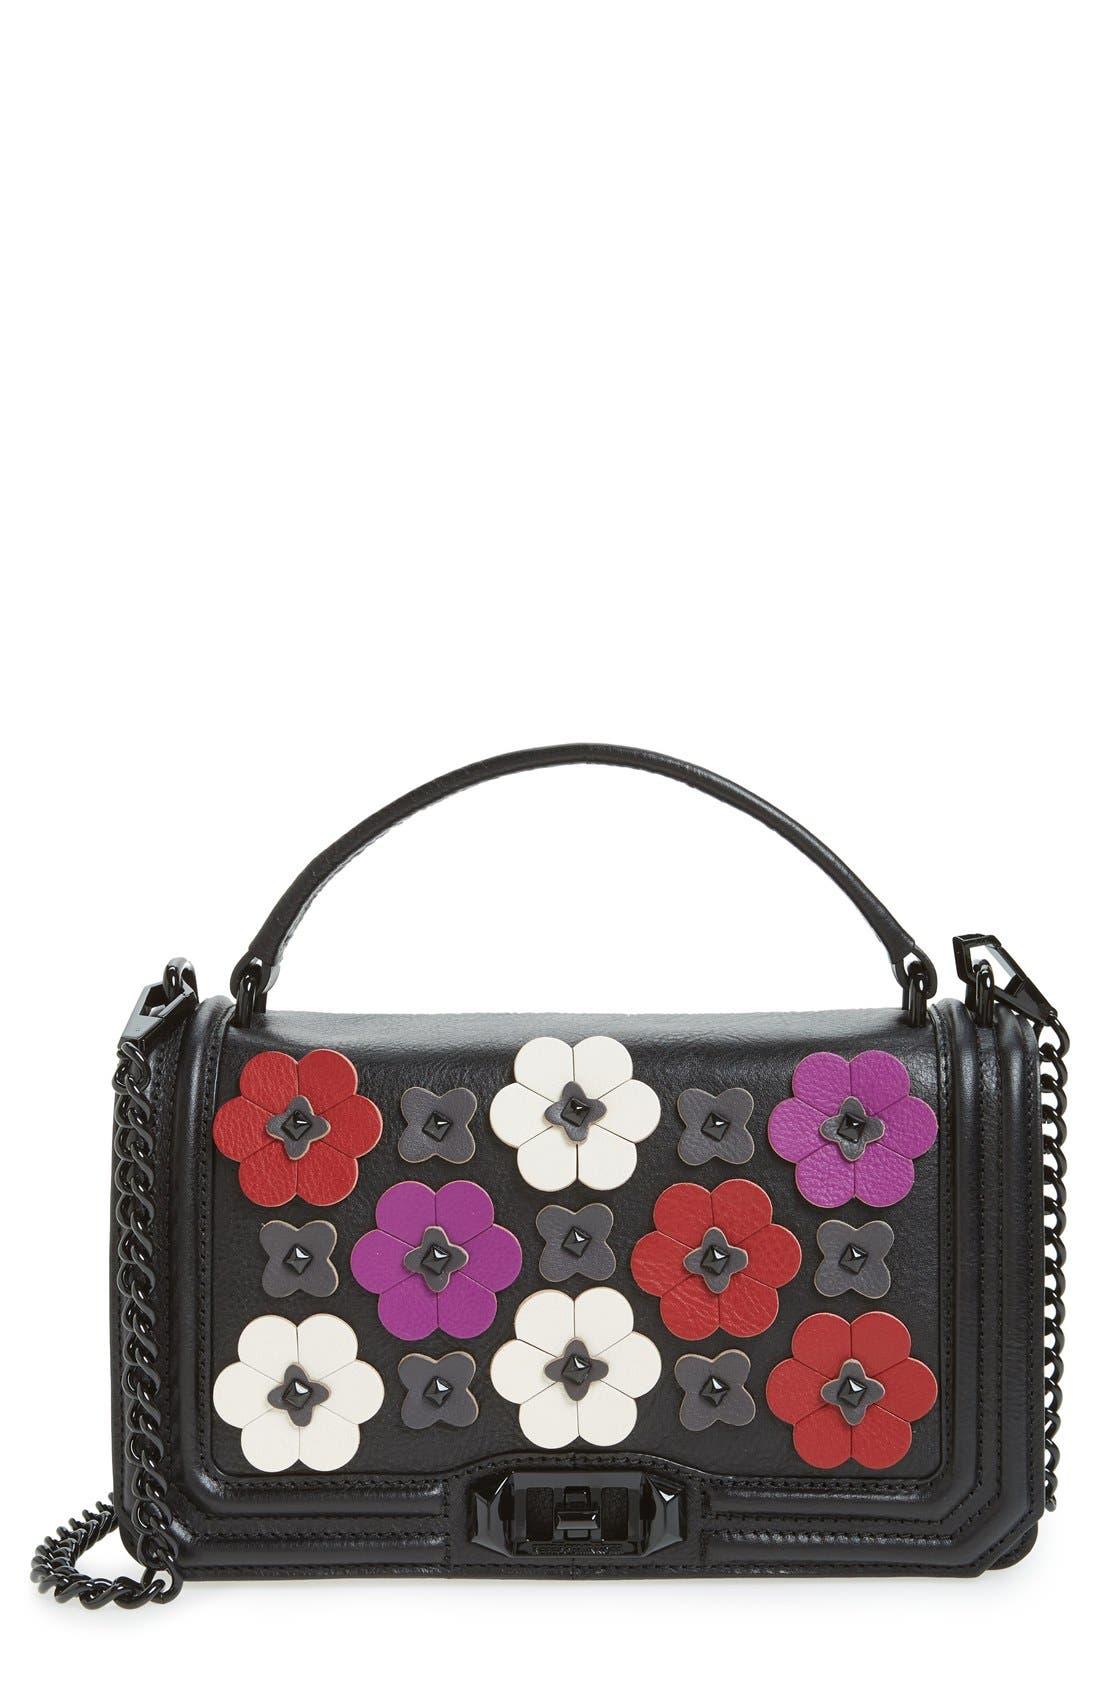 Alternate Image 1 Selected - Rebecca Minkoff Love Floral Appliqué Crossbody Bag